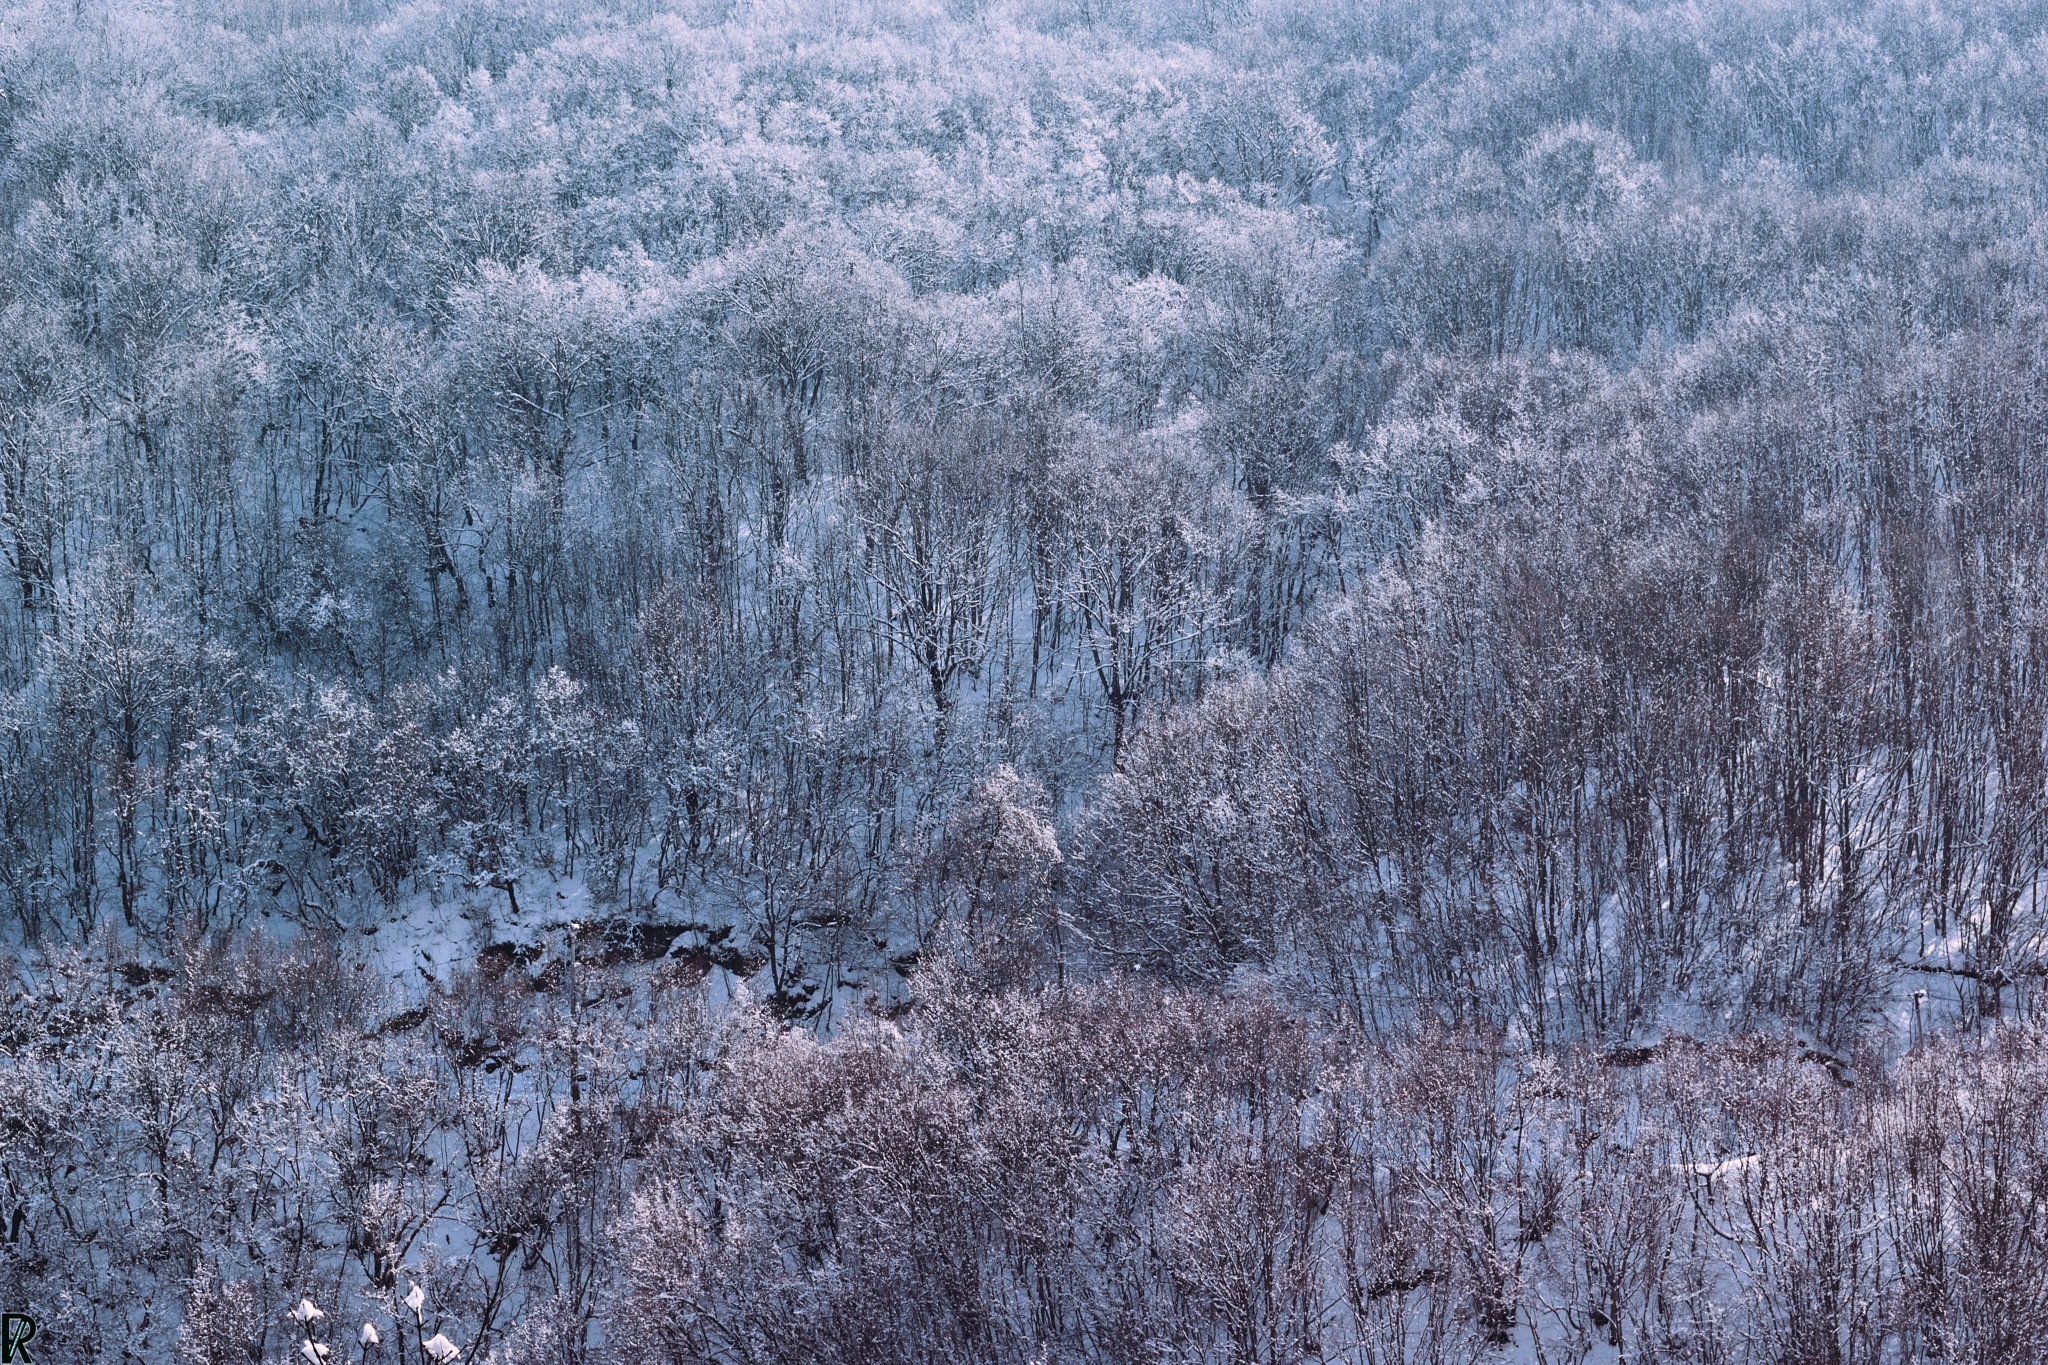 Winter in Kriva Palanka, Macedonia (11) by Robert Krstevski